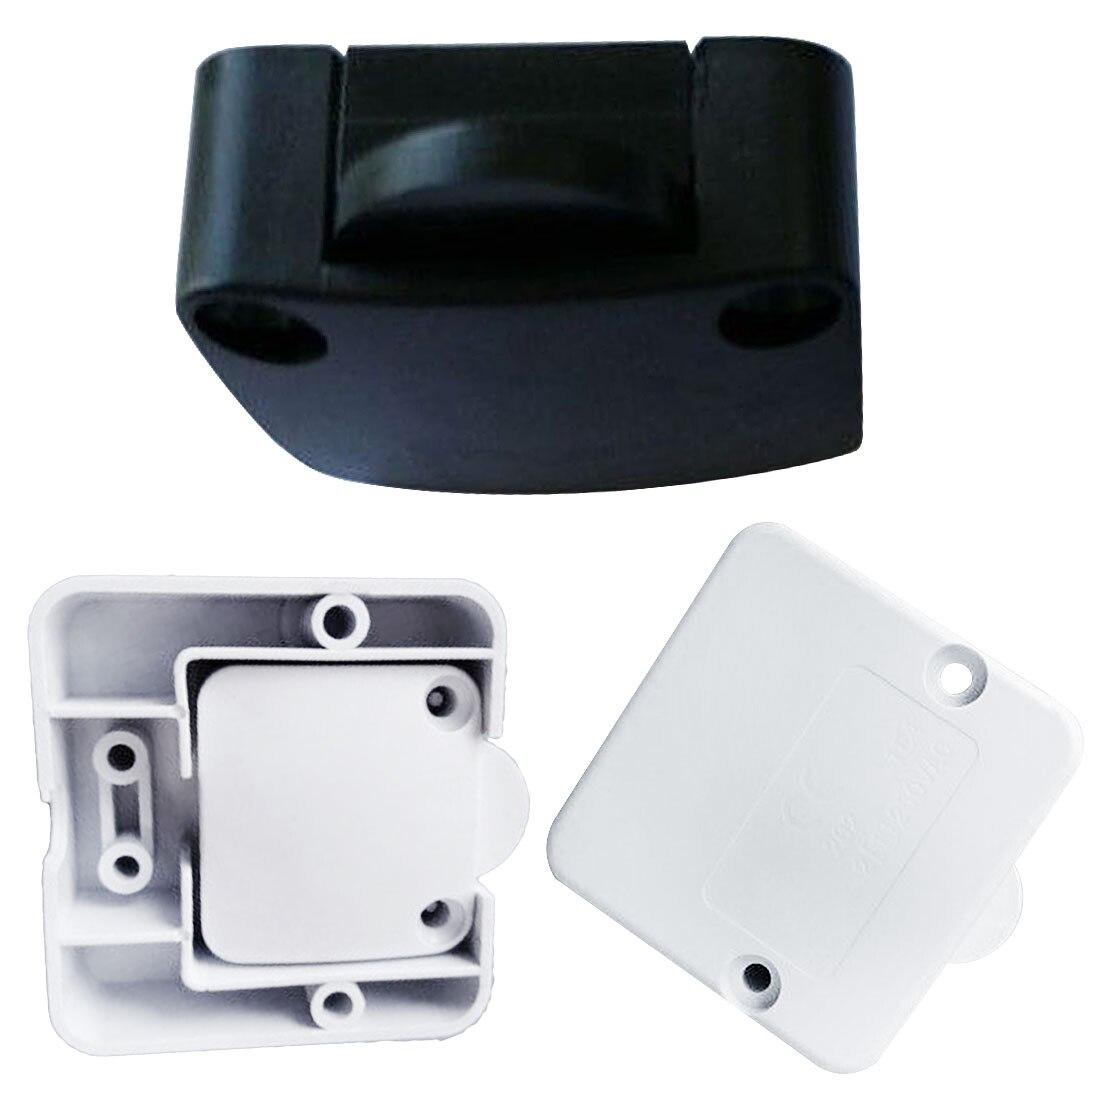 Hot Automatic Reset Switch Wardrobe Cabinet Light Switch